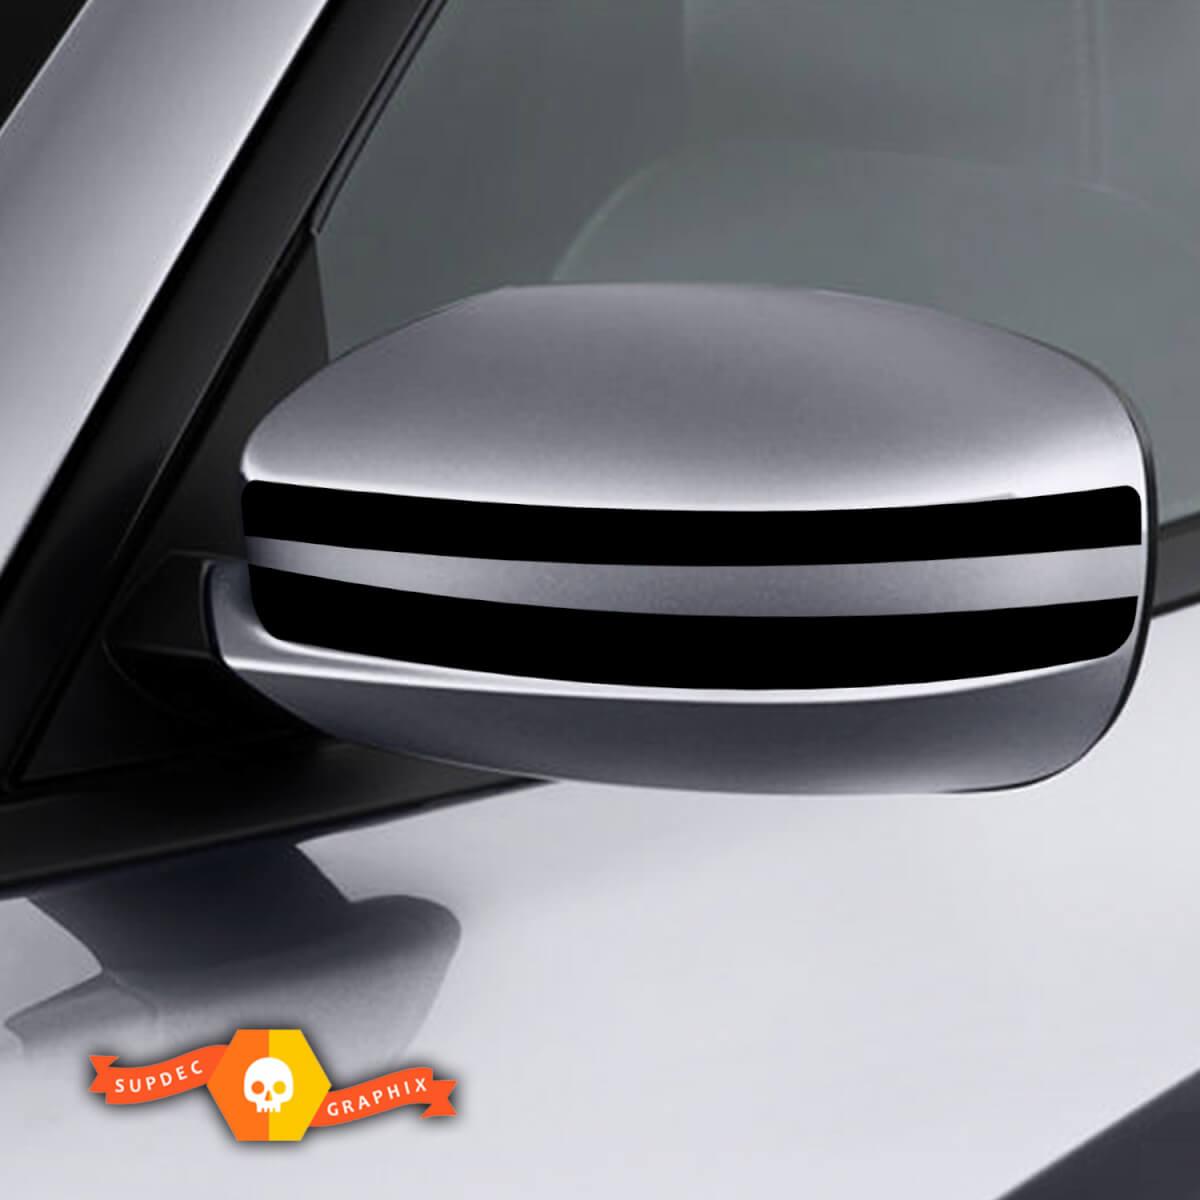 Dodge Charger Mirror Decal Aufkleber Streifengrafiken passt zu Modellen 2011-2016